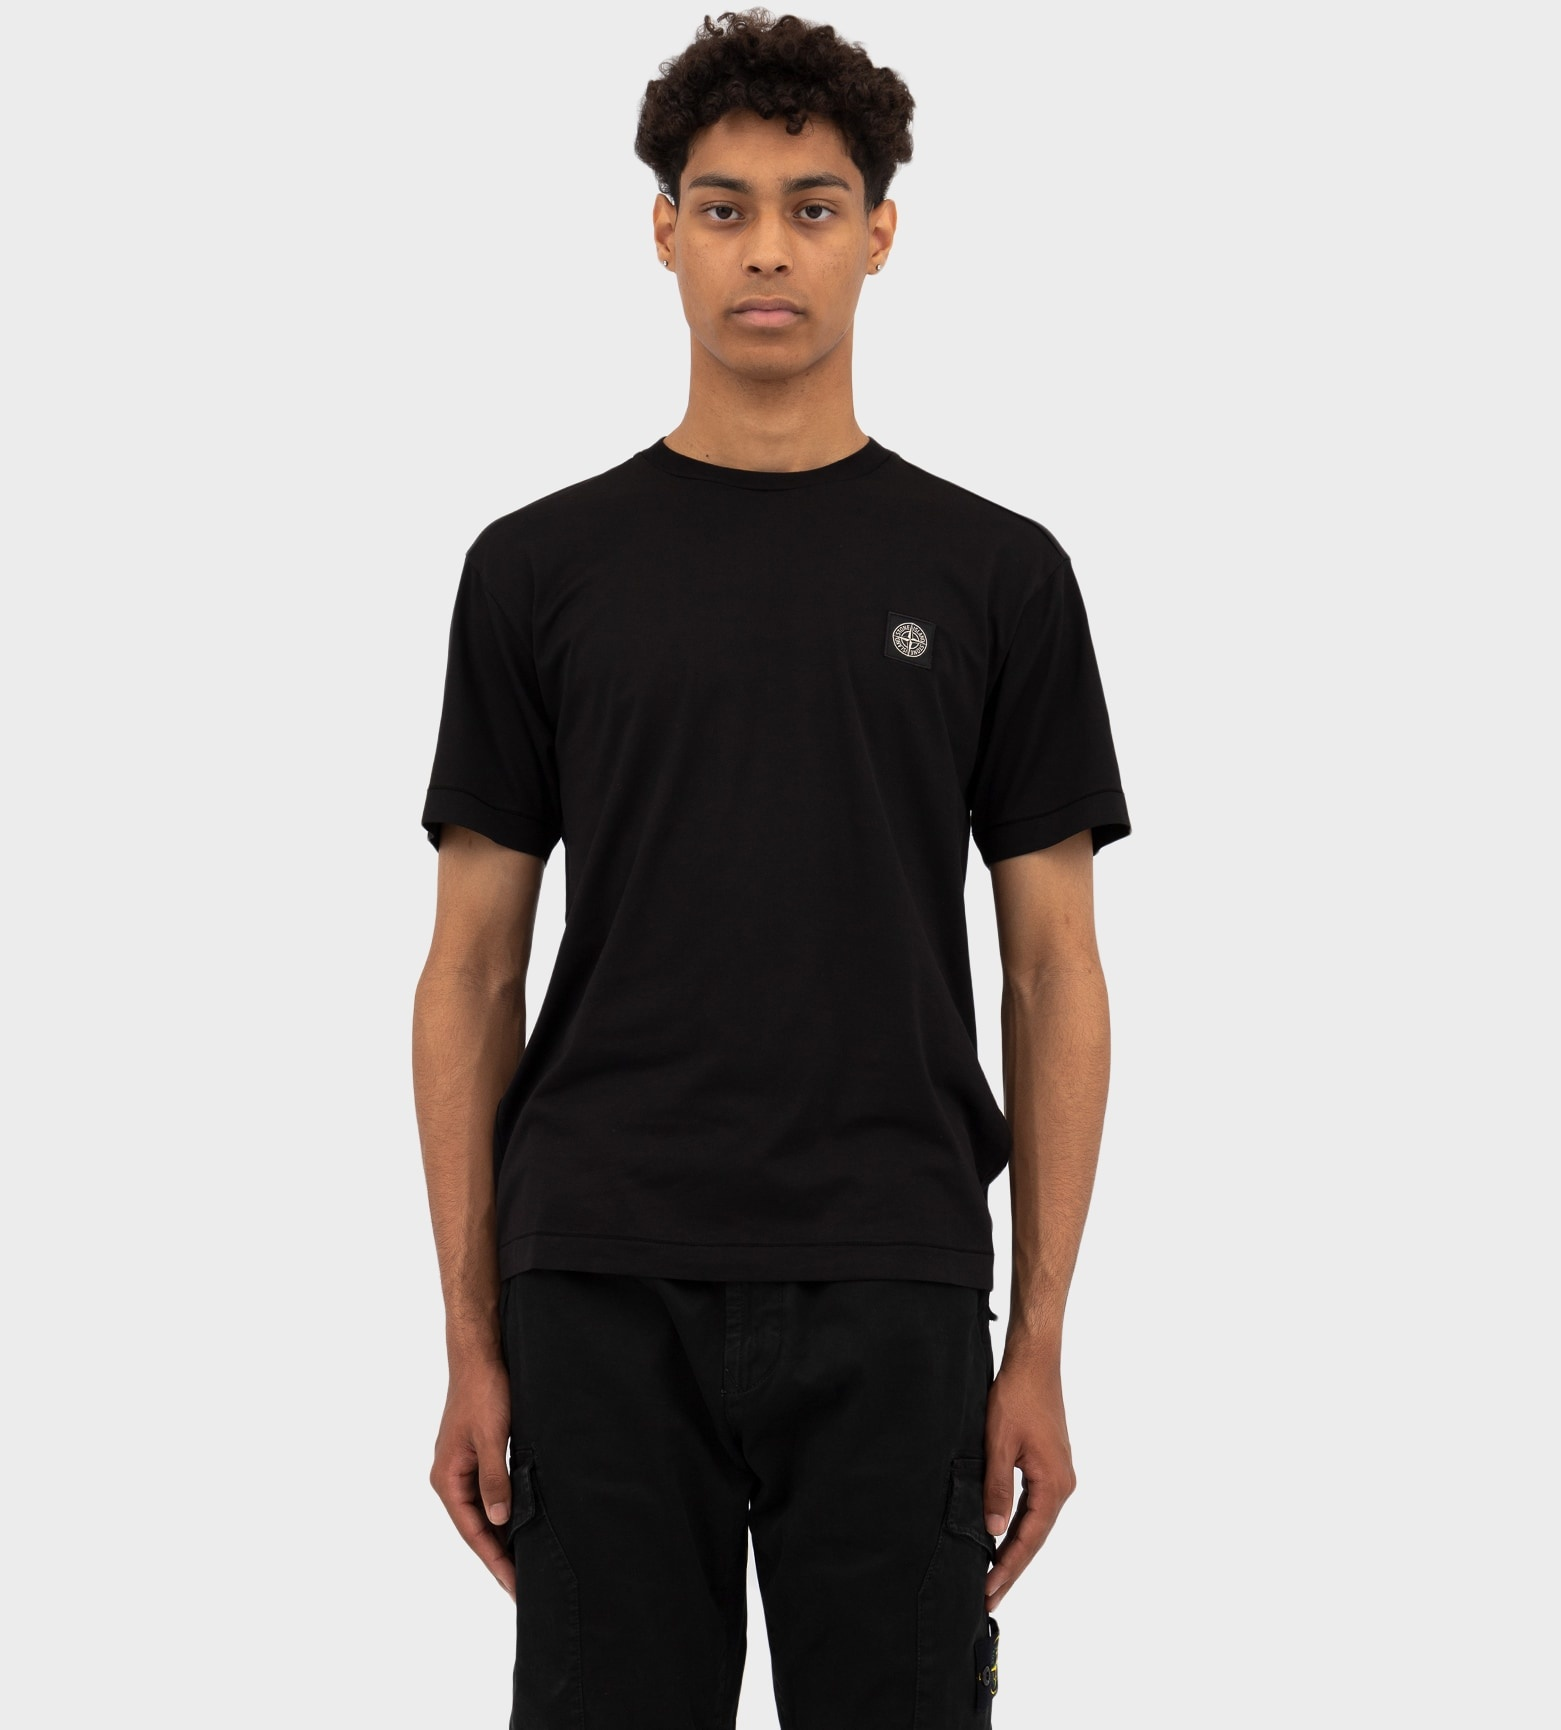 STONE ISLAND Compass Patch T-shirt Black